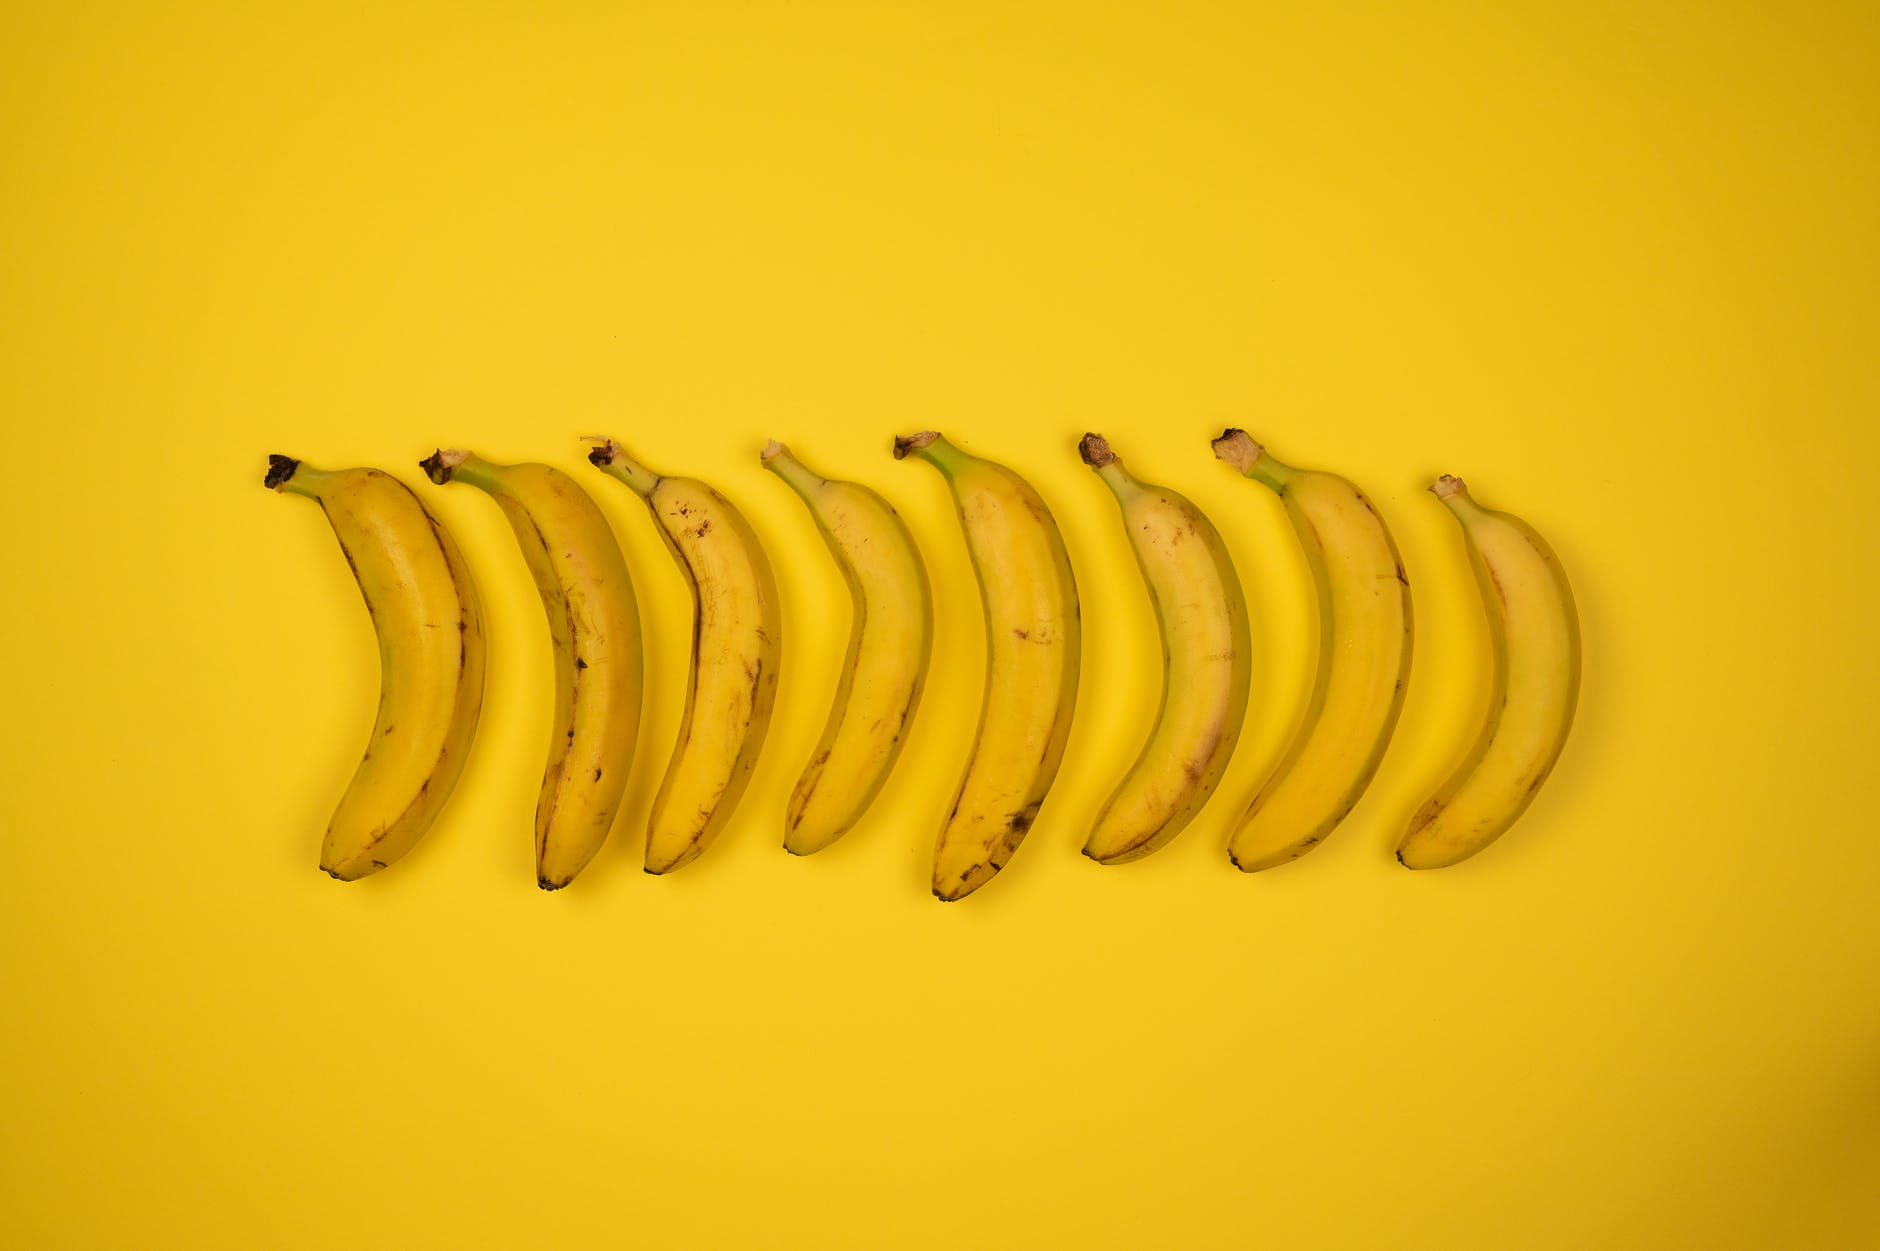 many calories in a banana